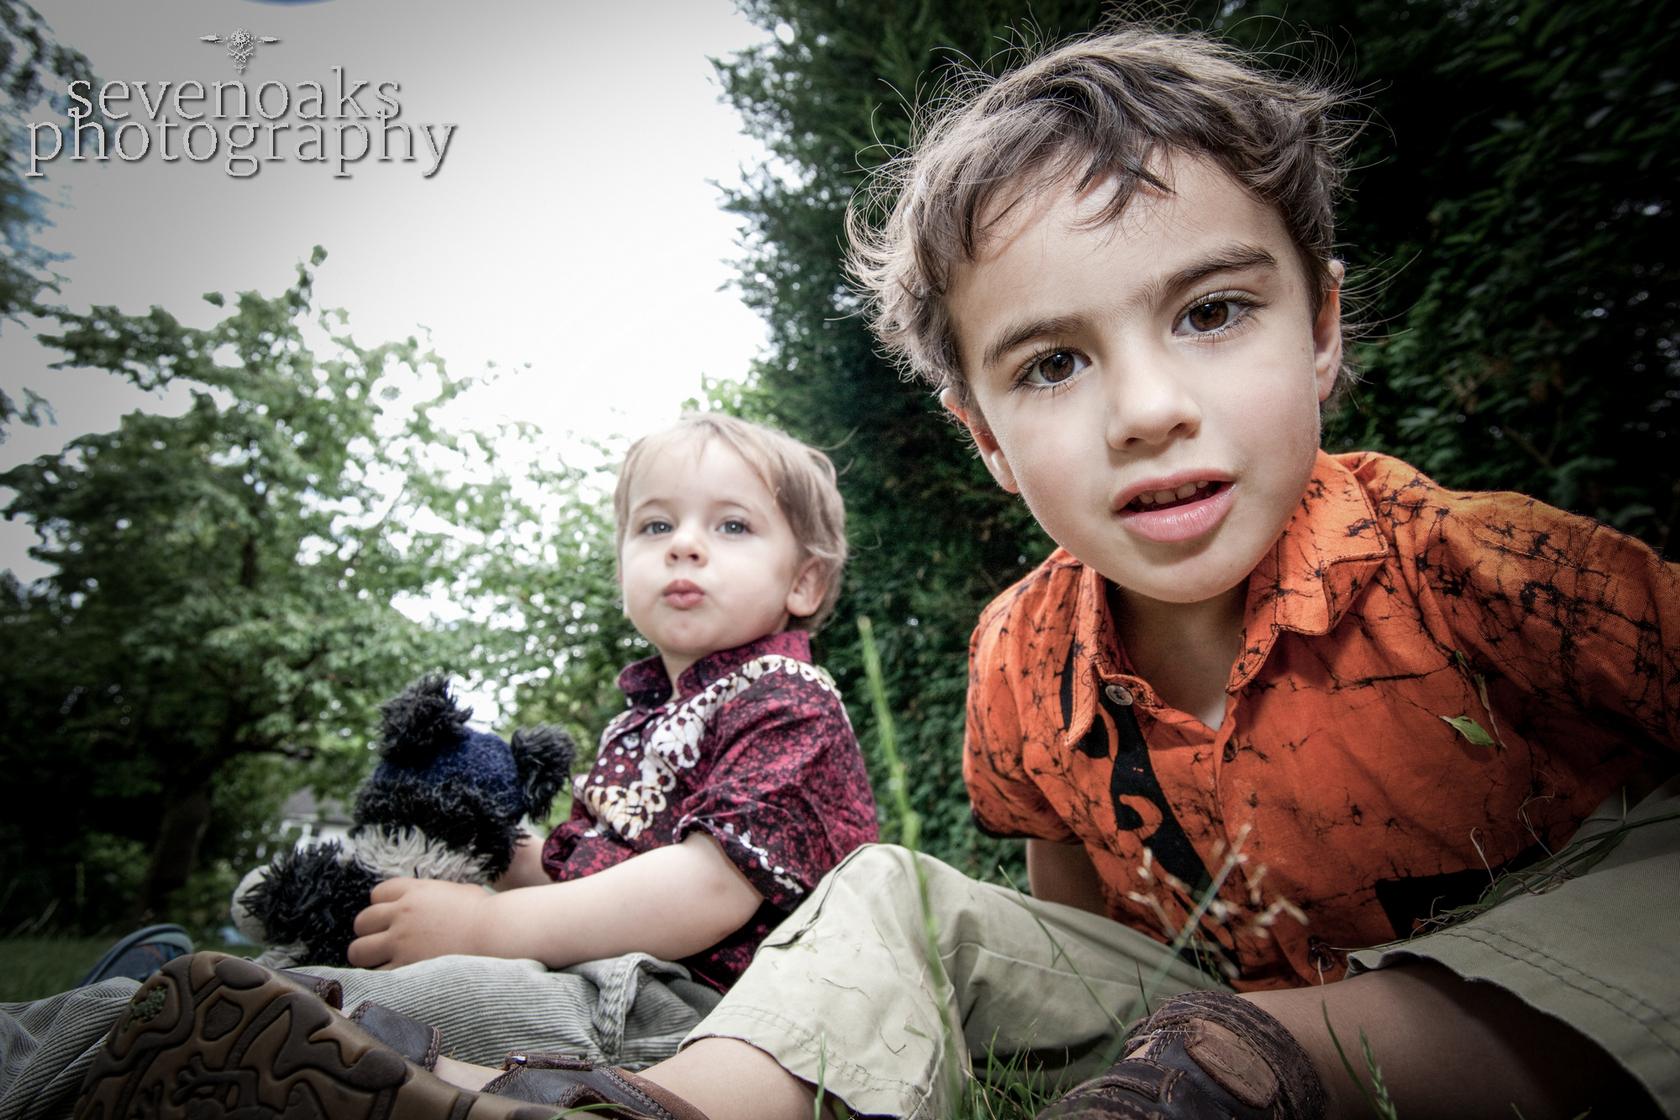 sevenoaks portrait photographer-6.jpg